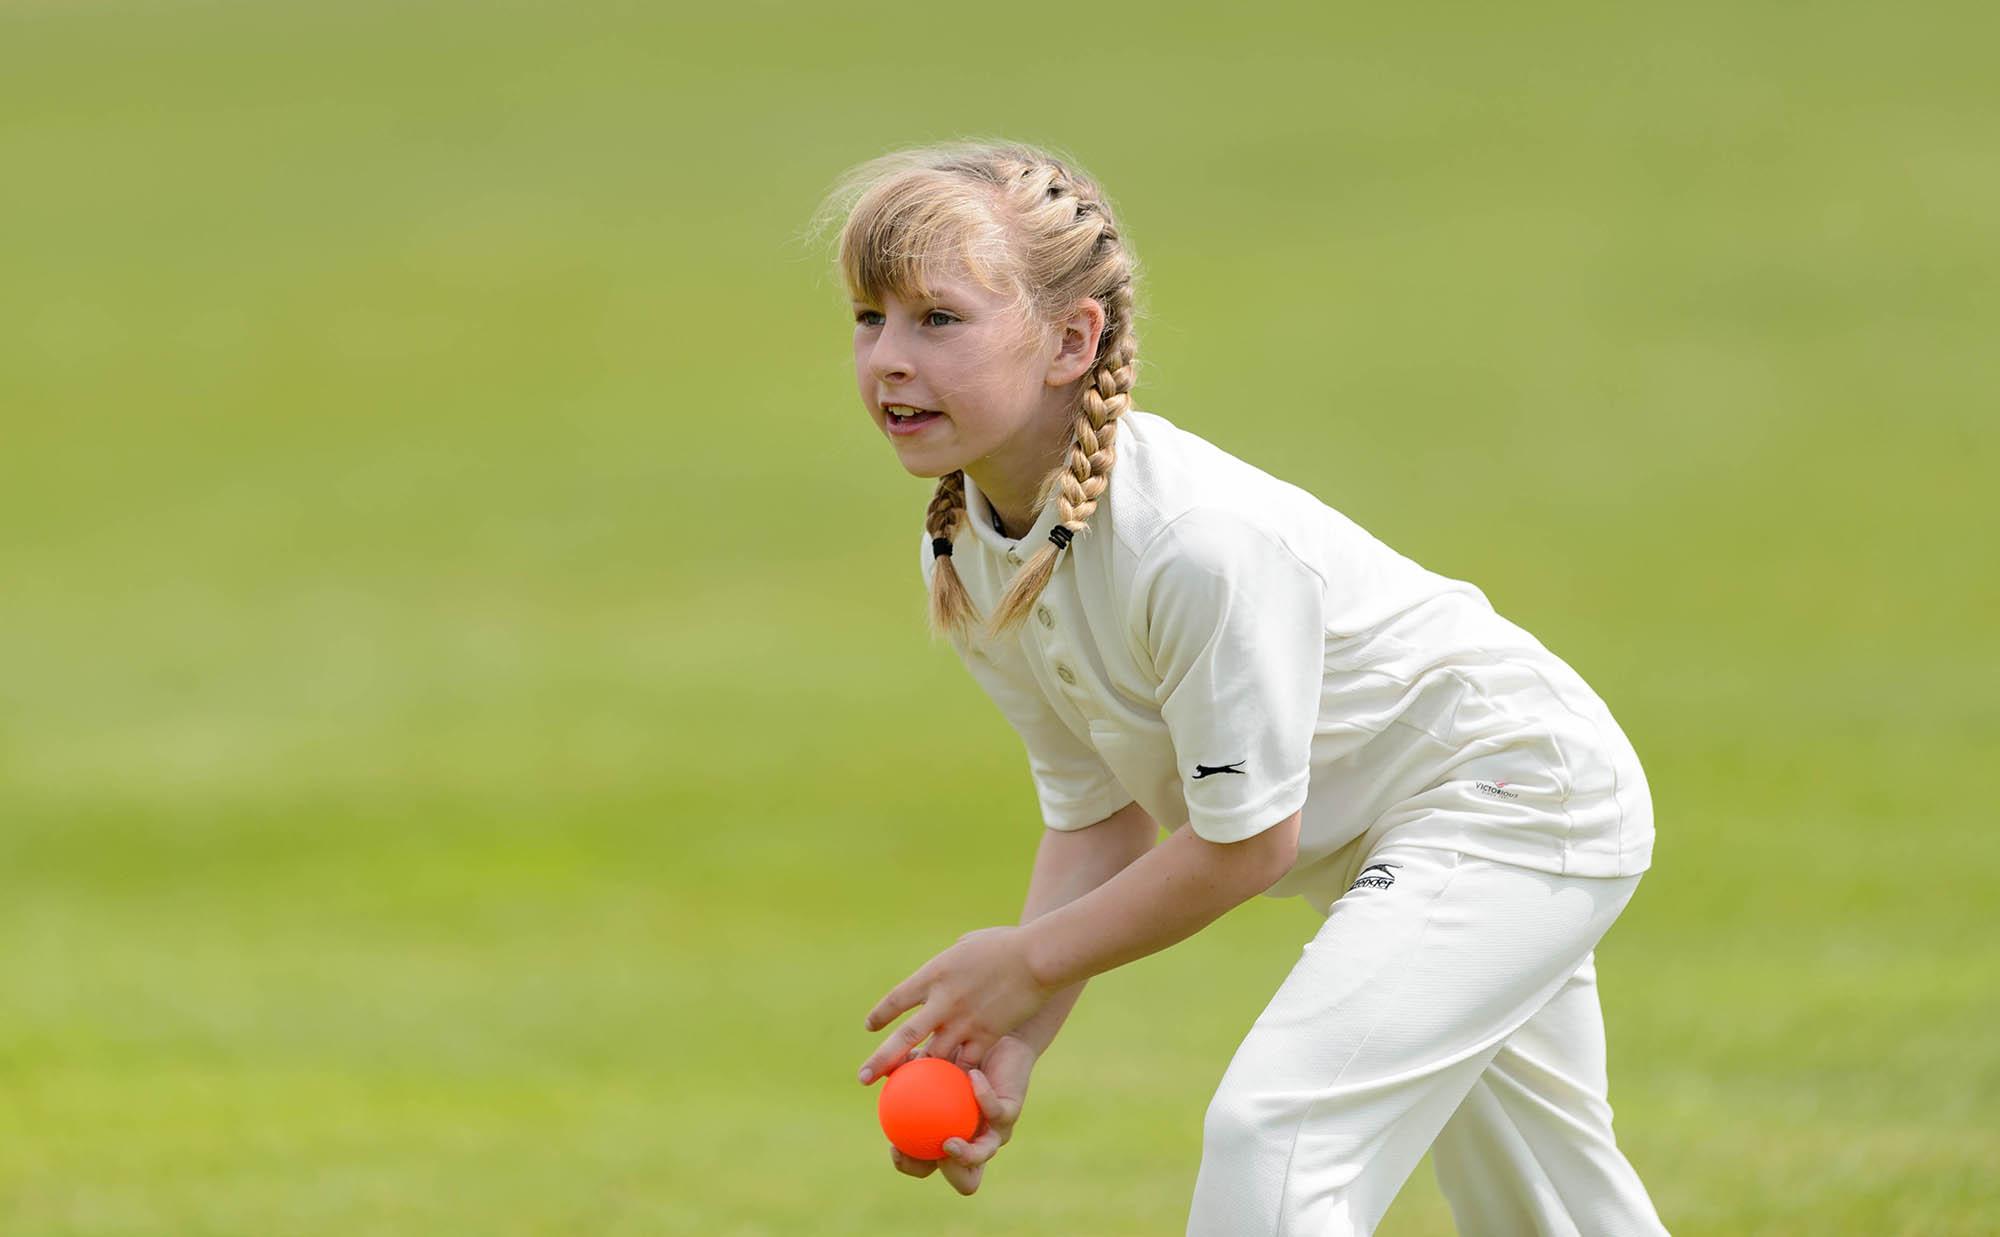 young girl throwing cricket ball